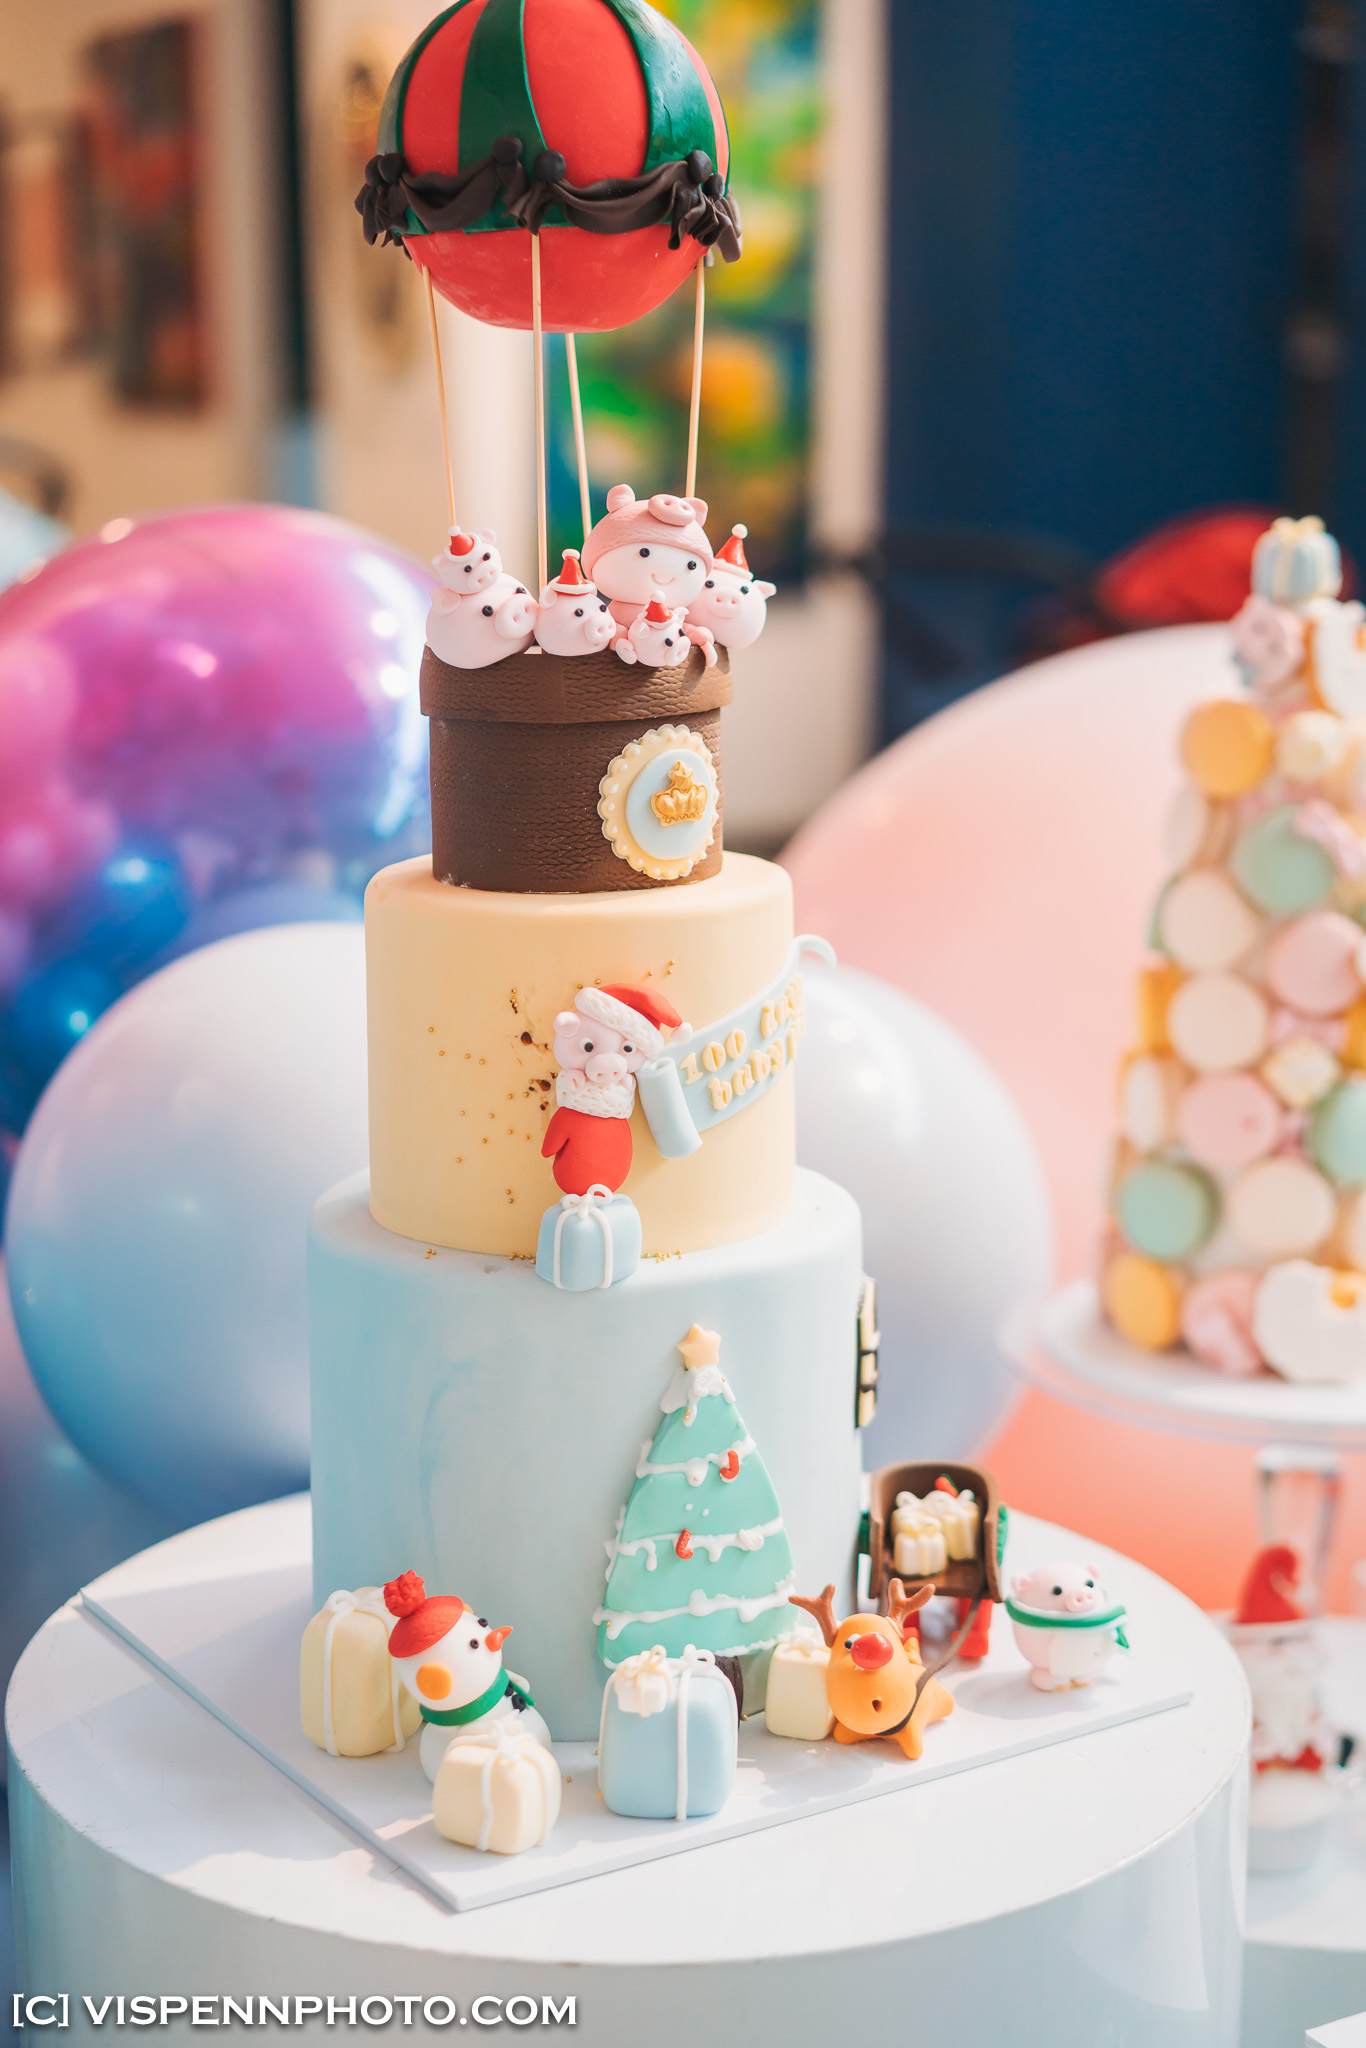 Melbourne Baby Family Birthday Party Photographer 墨尔本 百日宴 满月宴 周岁宴 摄影 VISPENN 100 Days 0120 Sony VISPENN